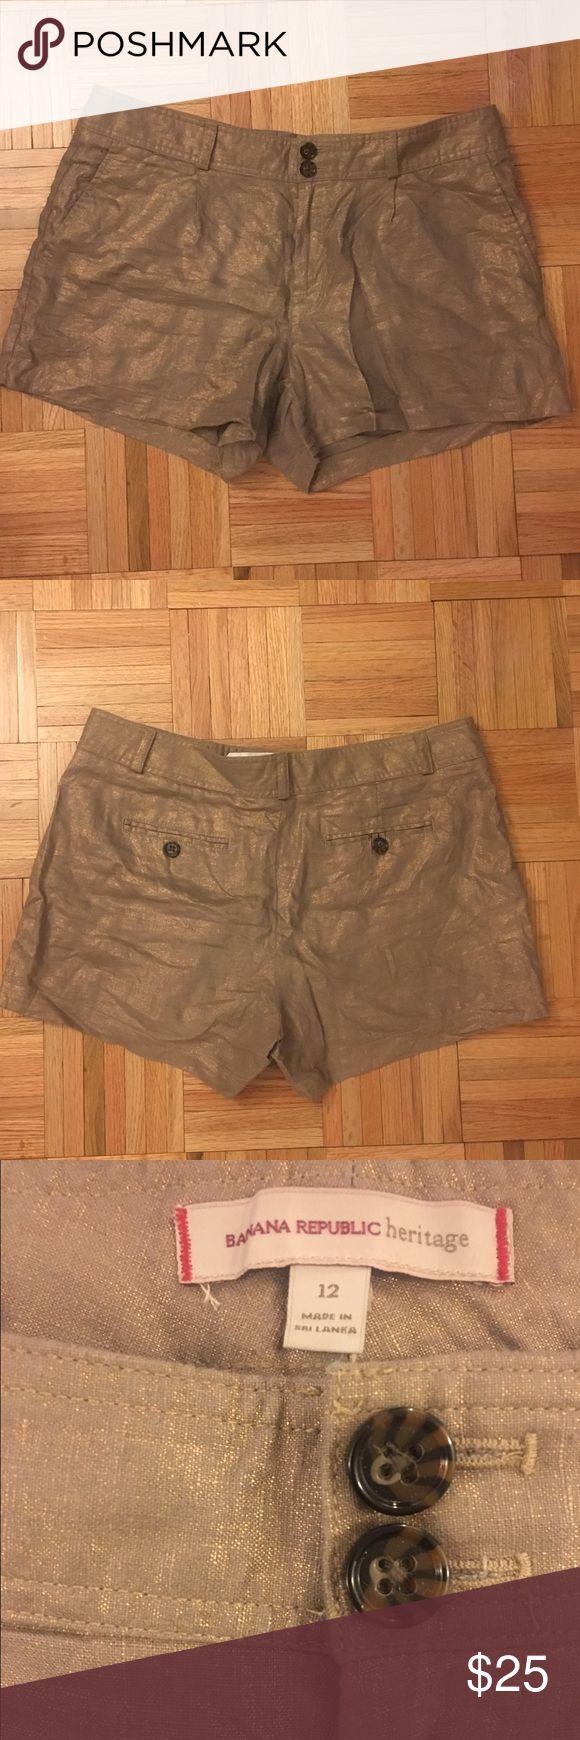 BANANA REPUBLIC HERITAGE   Metallic shorts 100% linen metallic tan and gold shorts from BANANA REPUBLIC HERITAGE Collection. Like new! Banana Republic Shorts